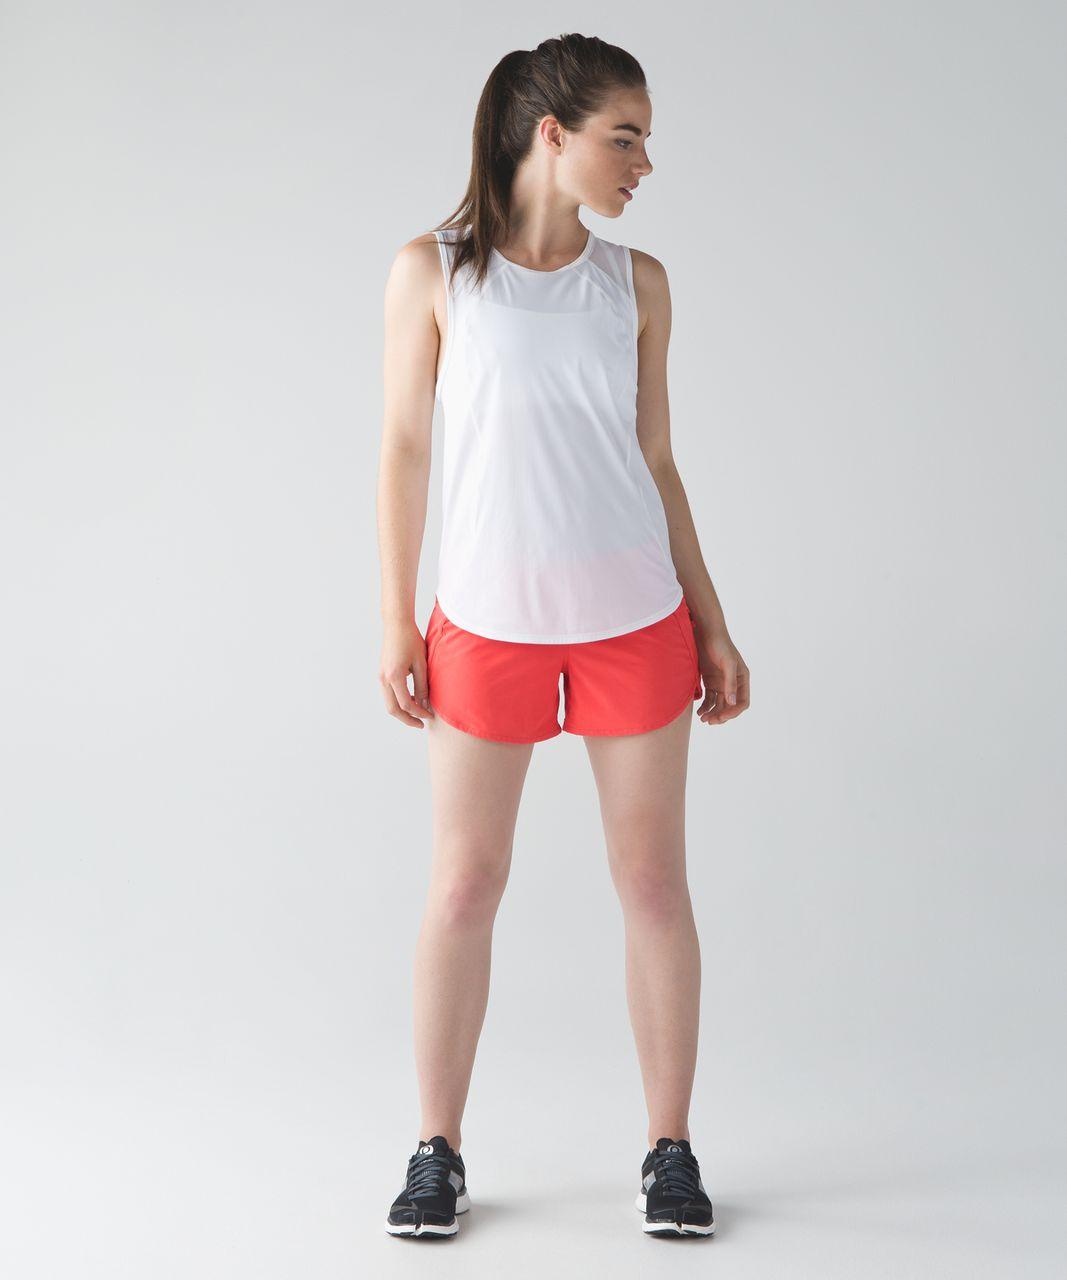 Lululemon Tracker Short IV (4-way Stretch) - Cape Red